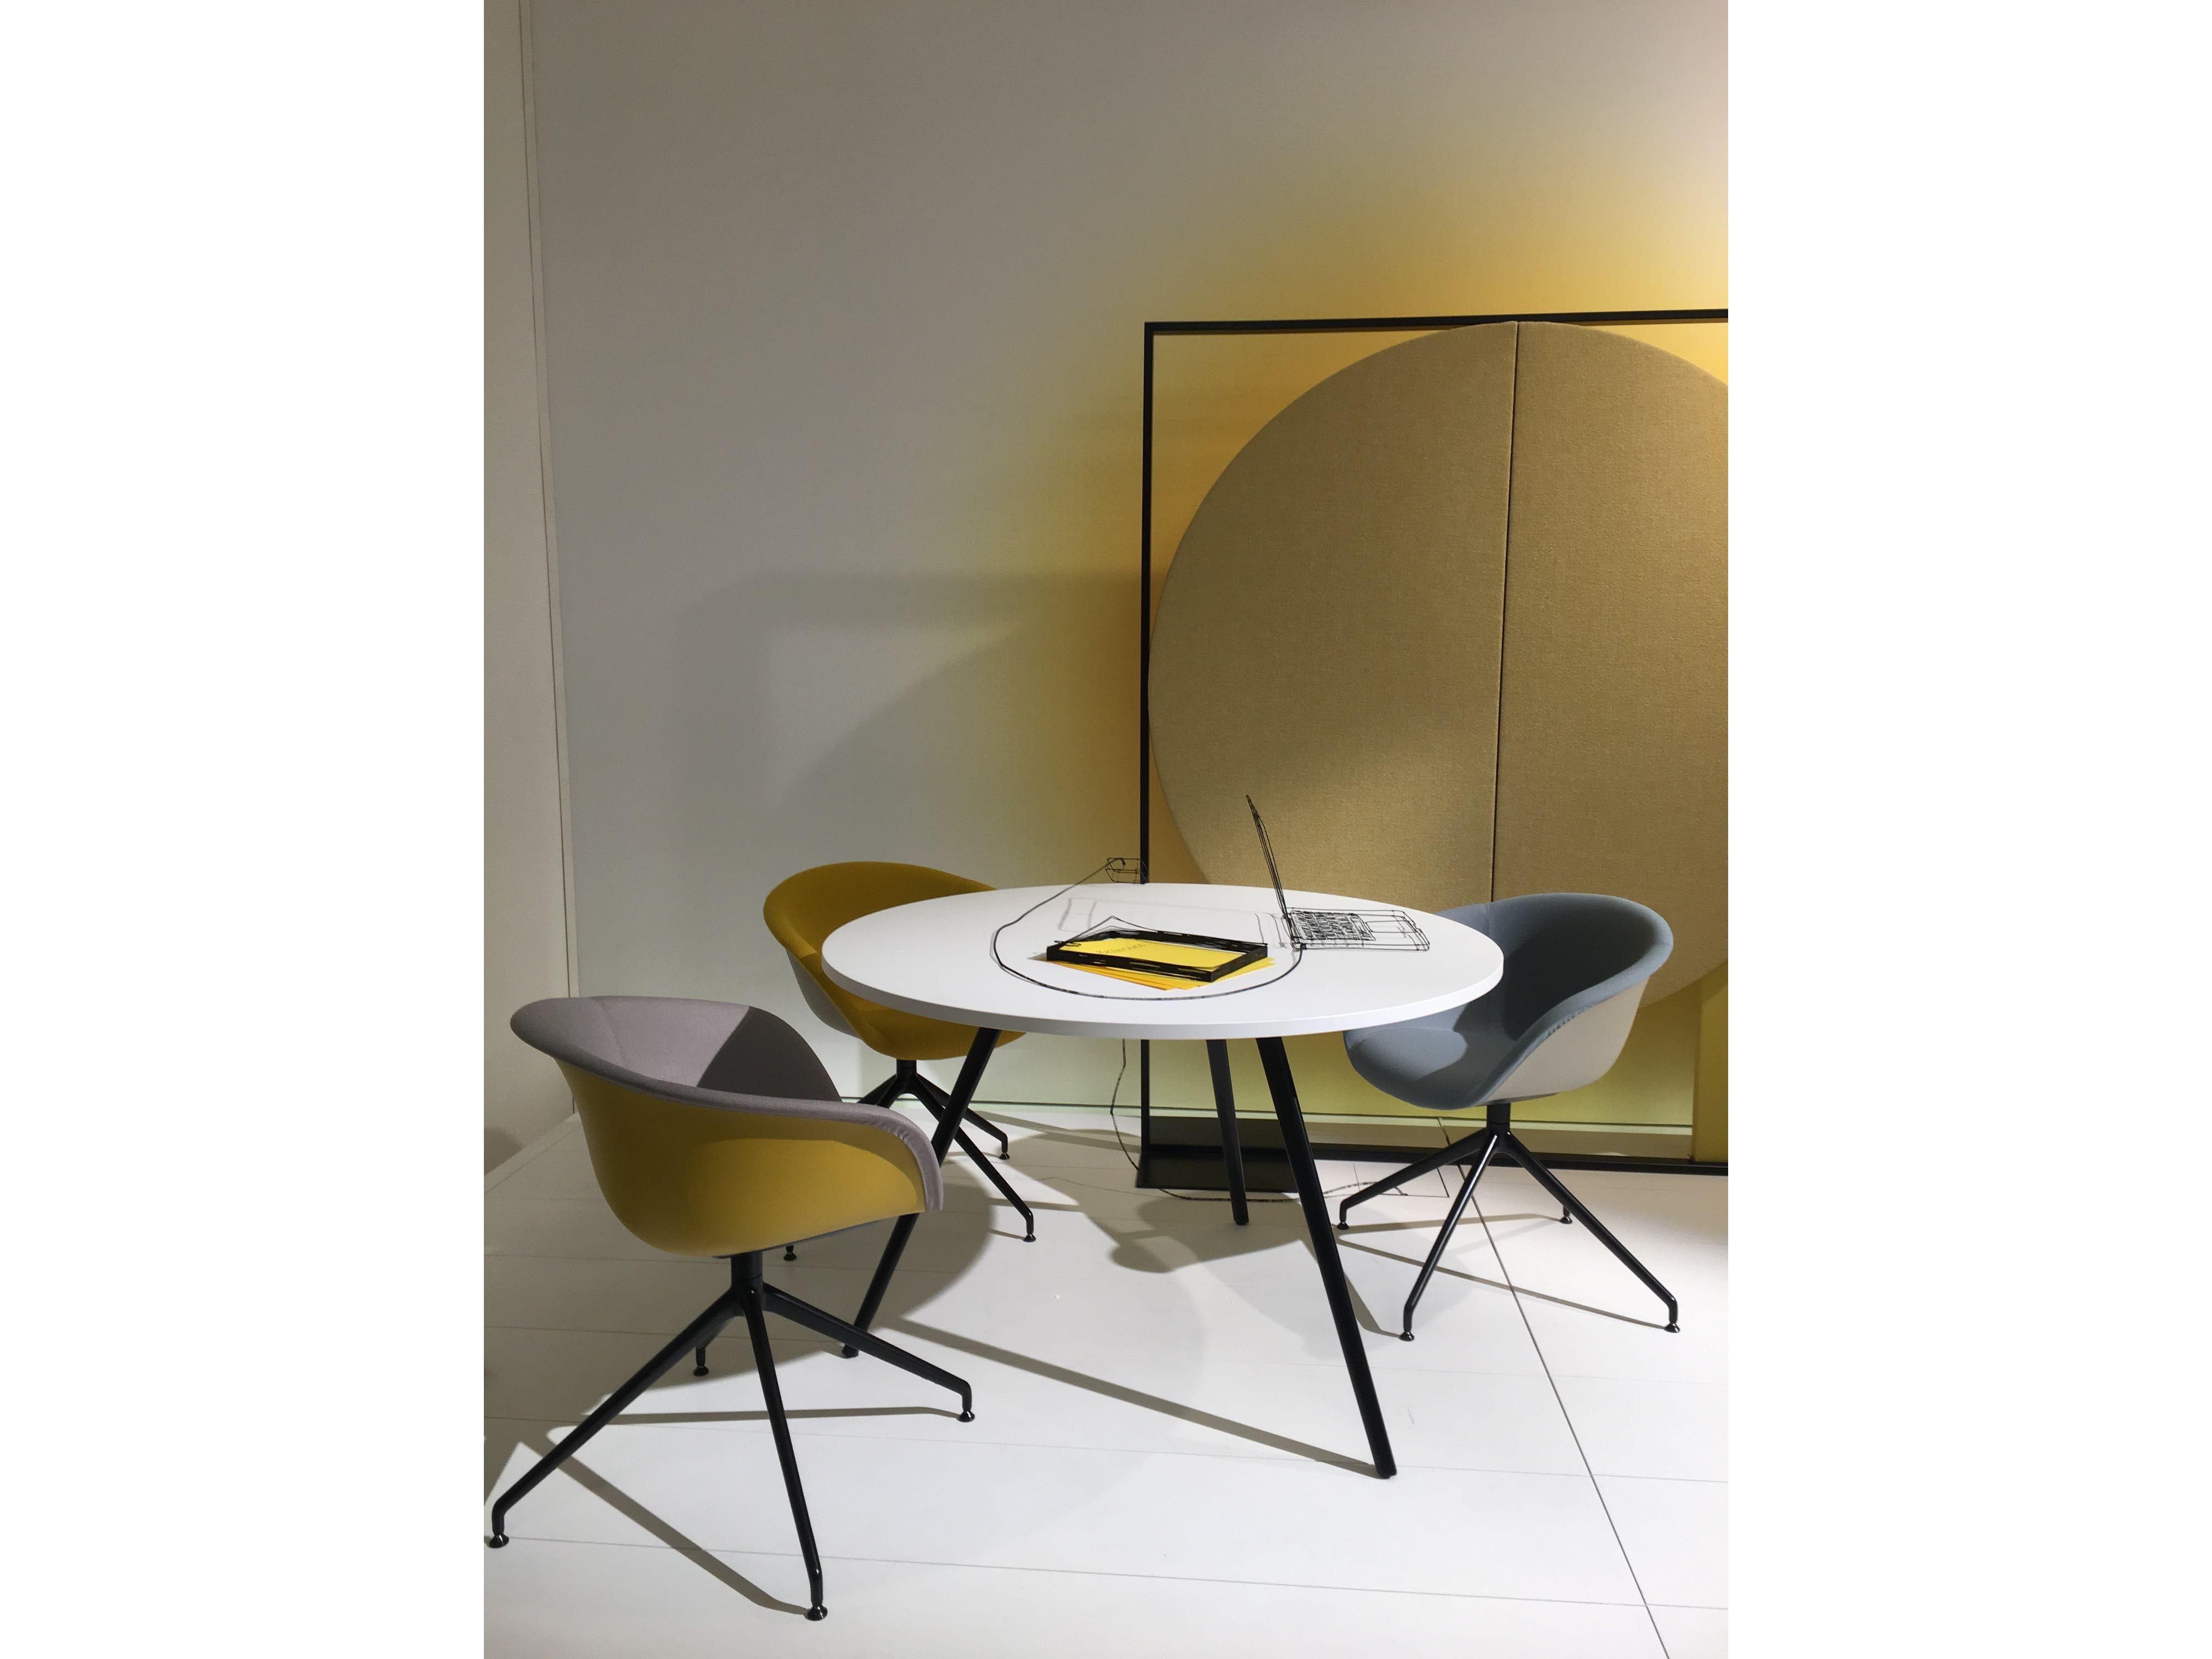 Surprising Duna Arper Pictures Duna Arper Images Duna Arper On Machost Co Dining Chair Design Ideas Machostcouk